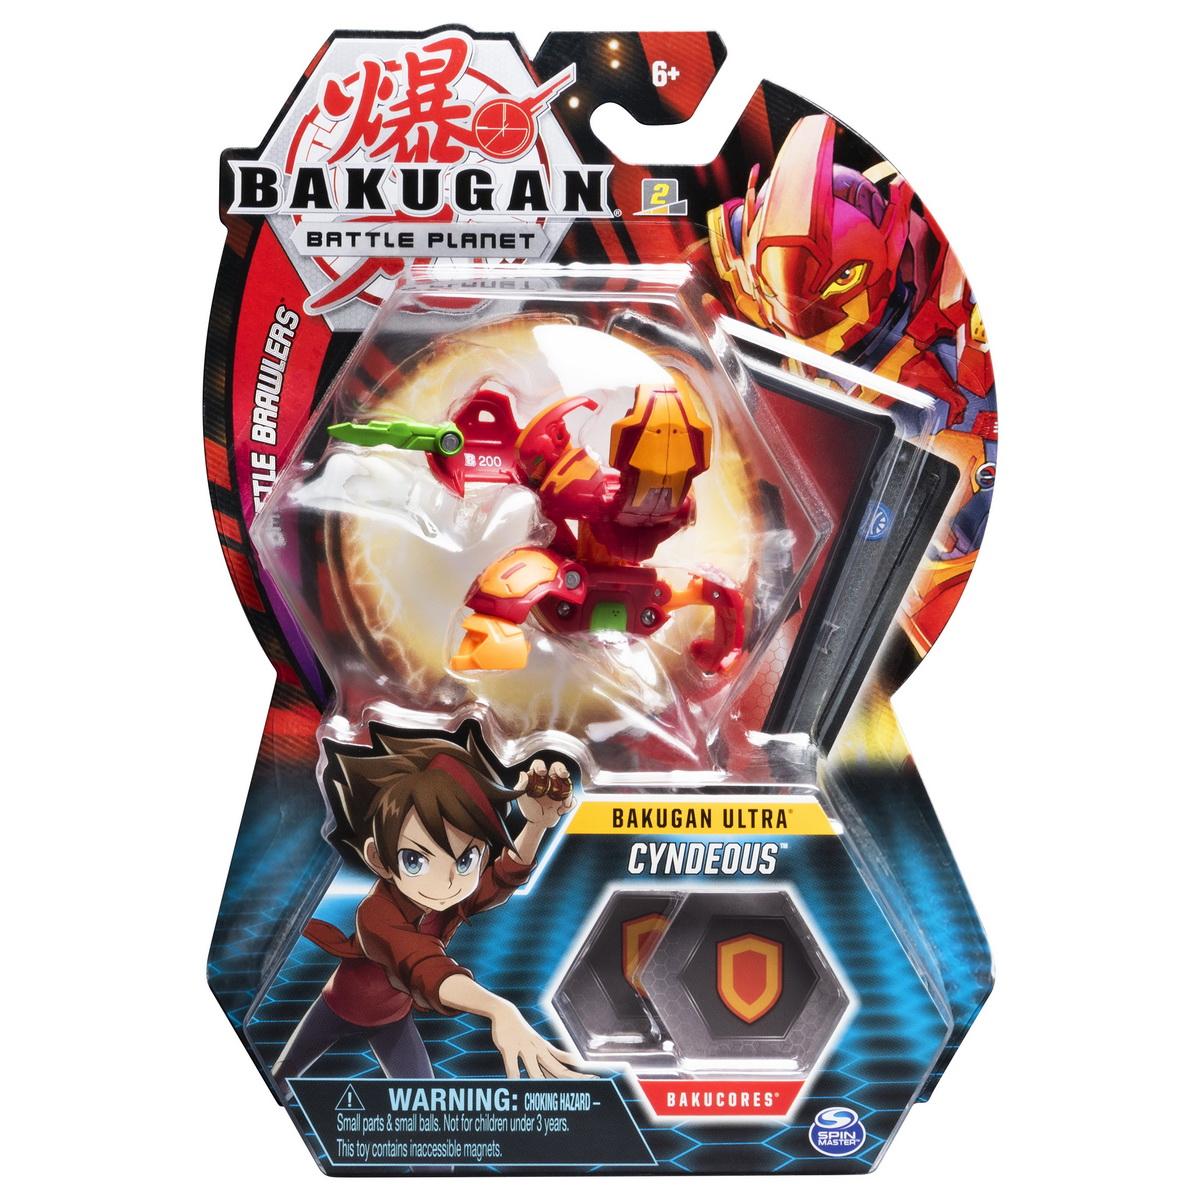 Bakugan Ultra Bila Cyndeous